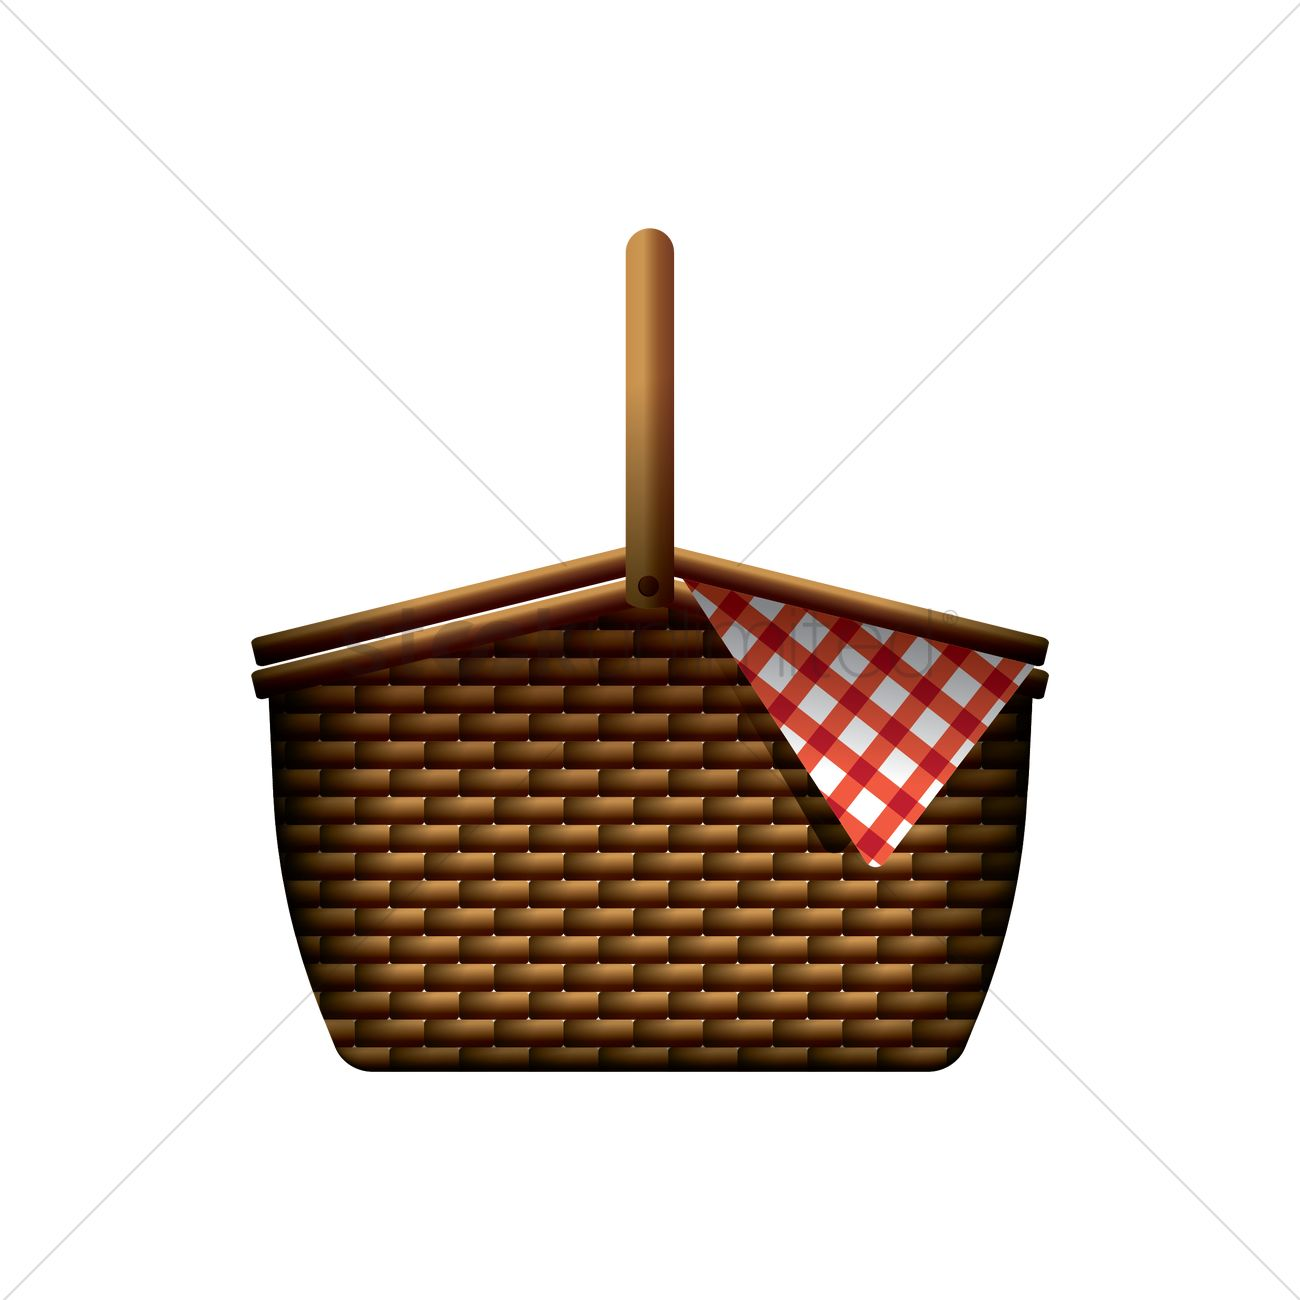 Picnic Basket Vector Image 1895495 Stockunlimited